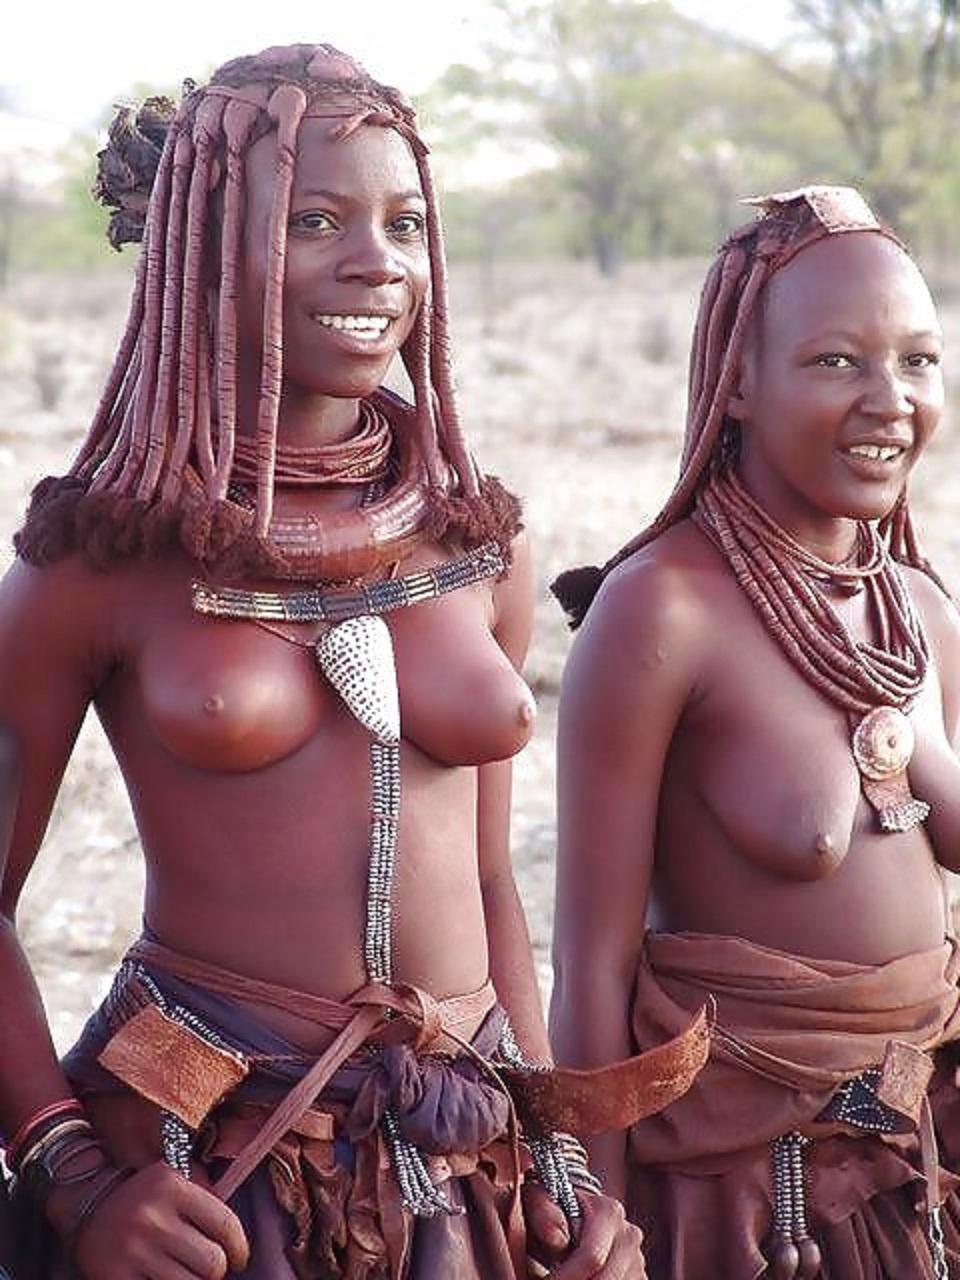 obnazhennie-devushki-tuzemnih-plemen